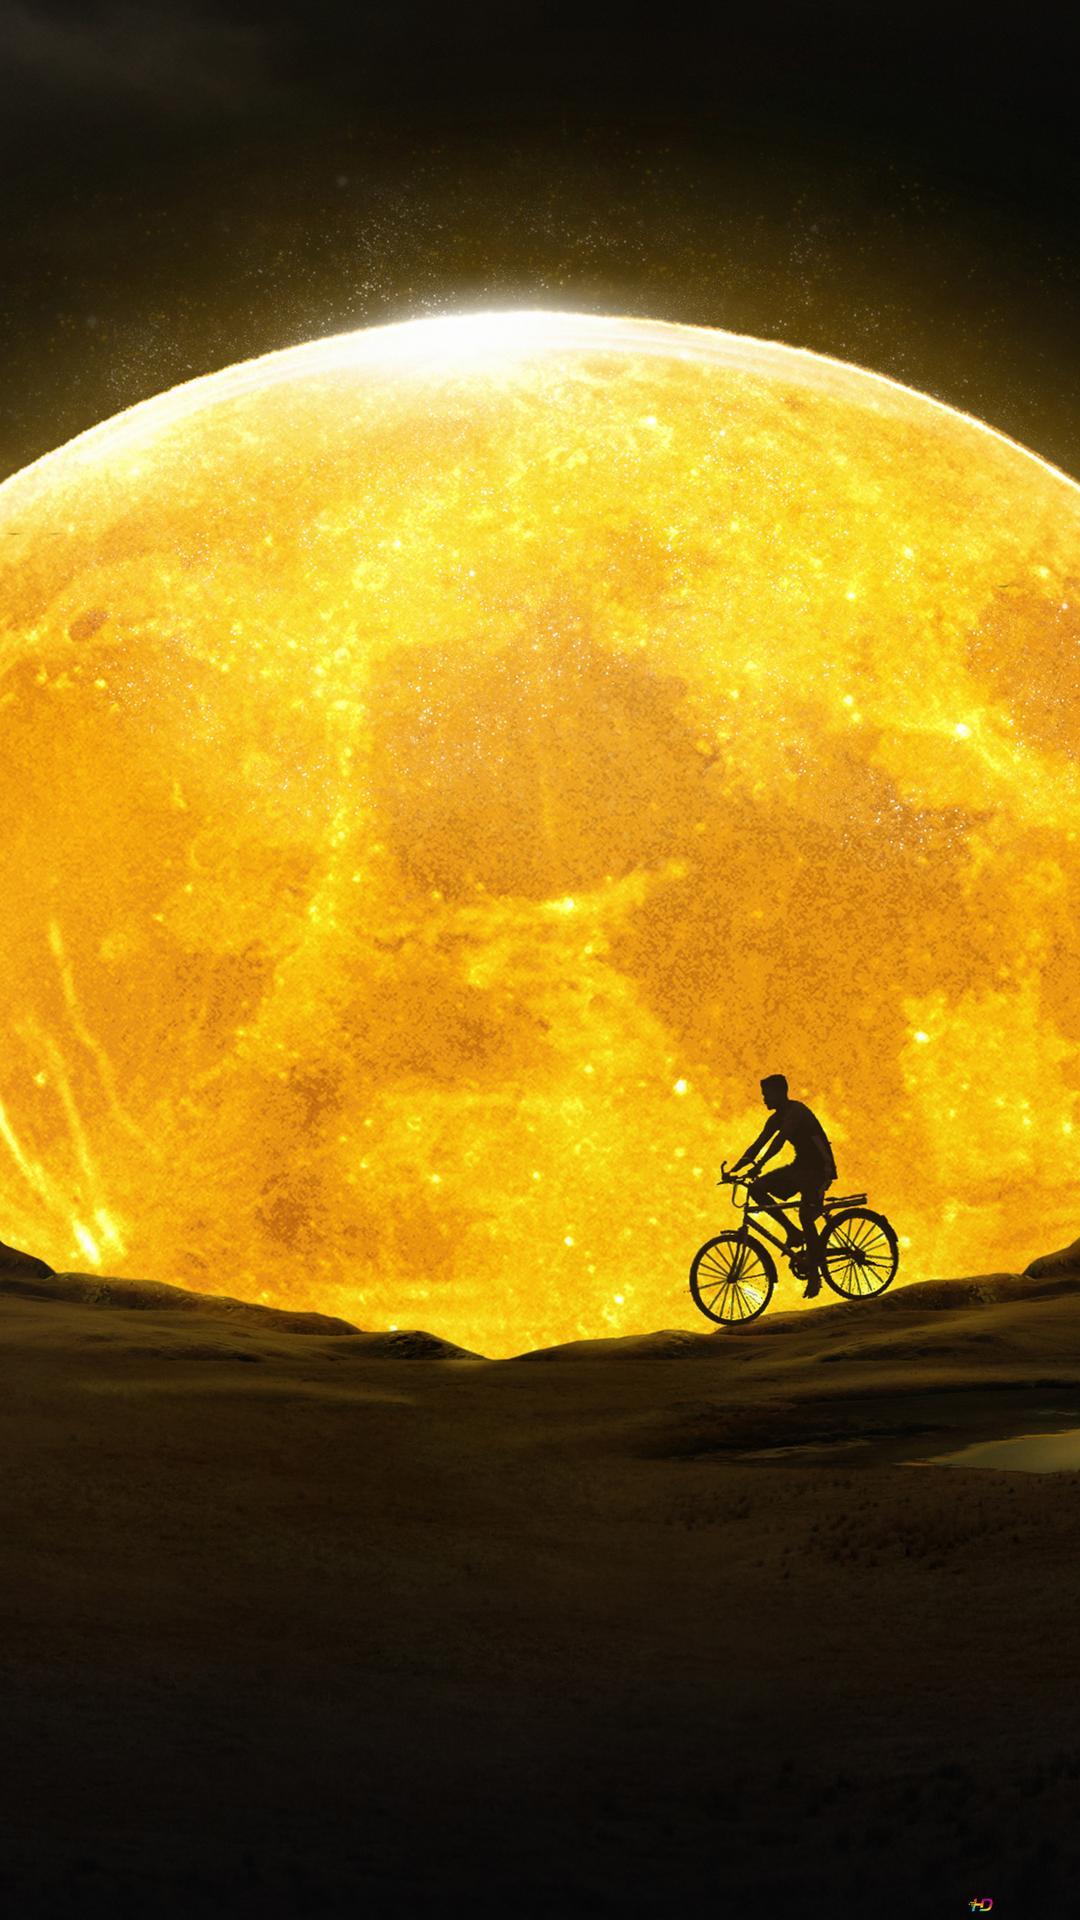 yellow moon wallpaper 1080x1920 32294 165